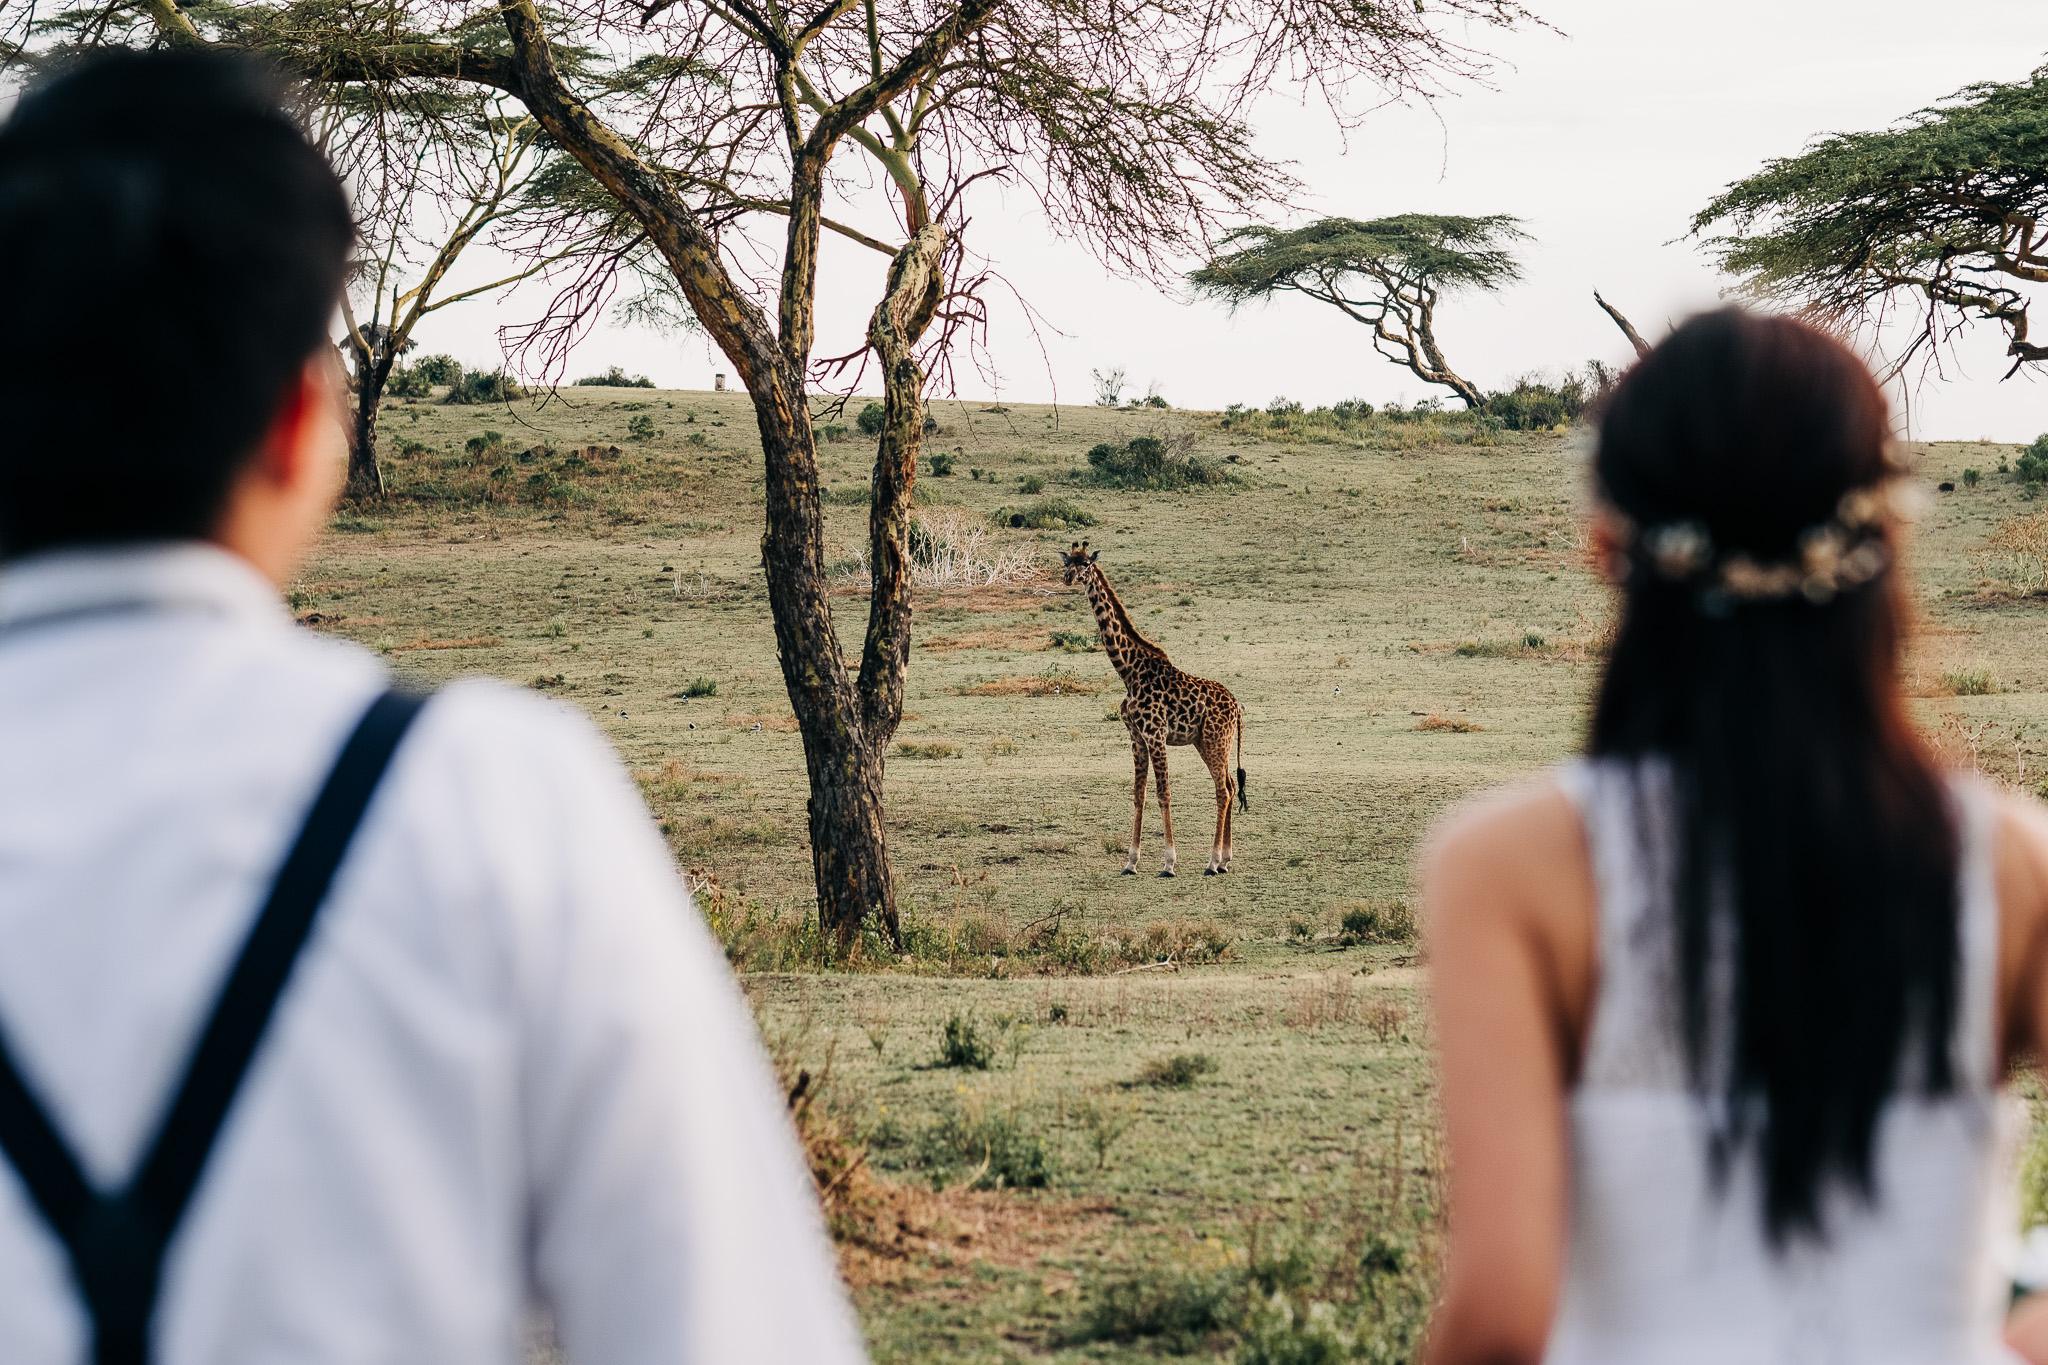 Anna-Hari-Photography-Safari-Elopement-Kenya-Wedding-Photographer-Kenya-80.jpg